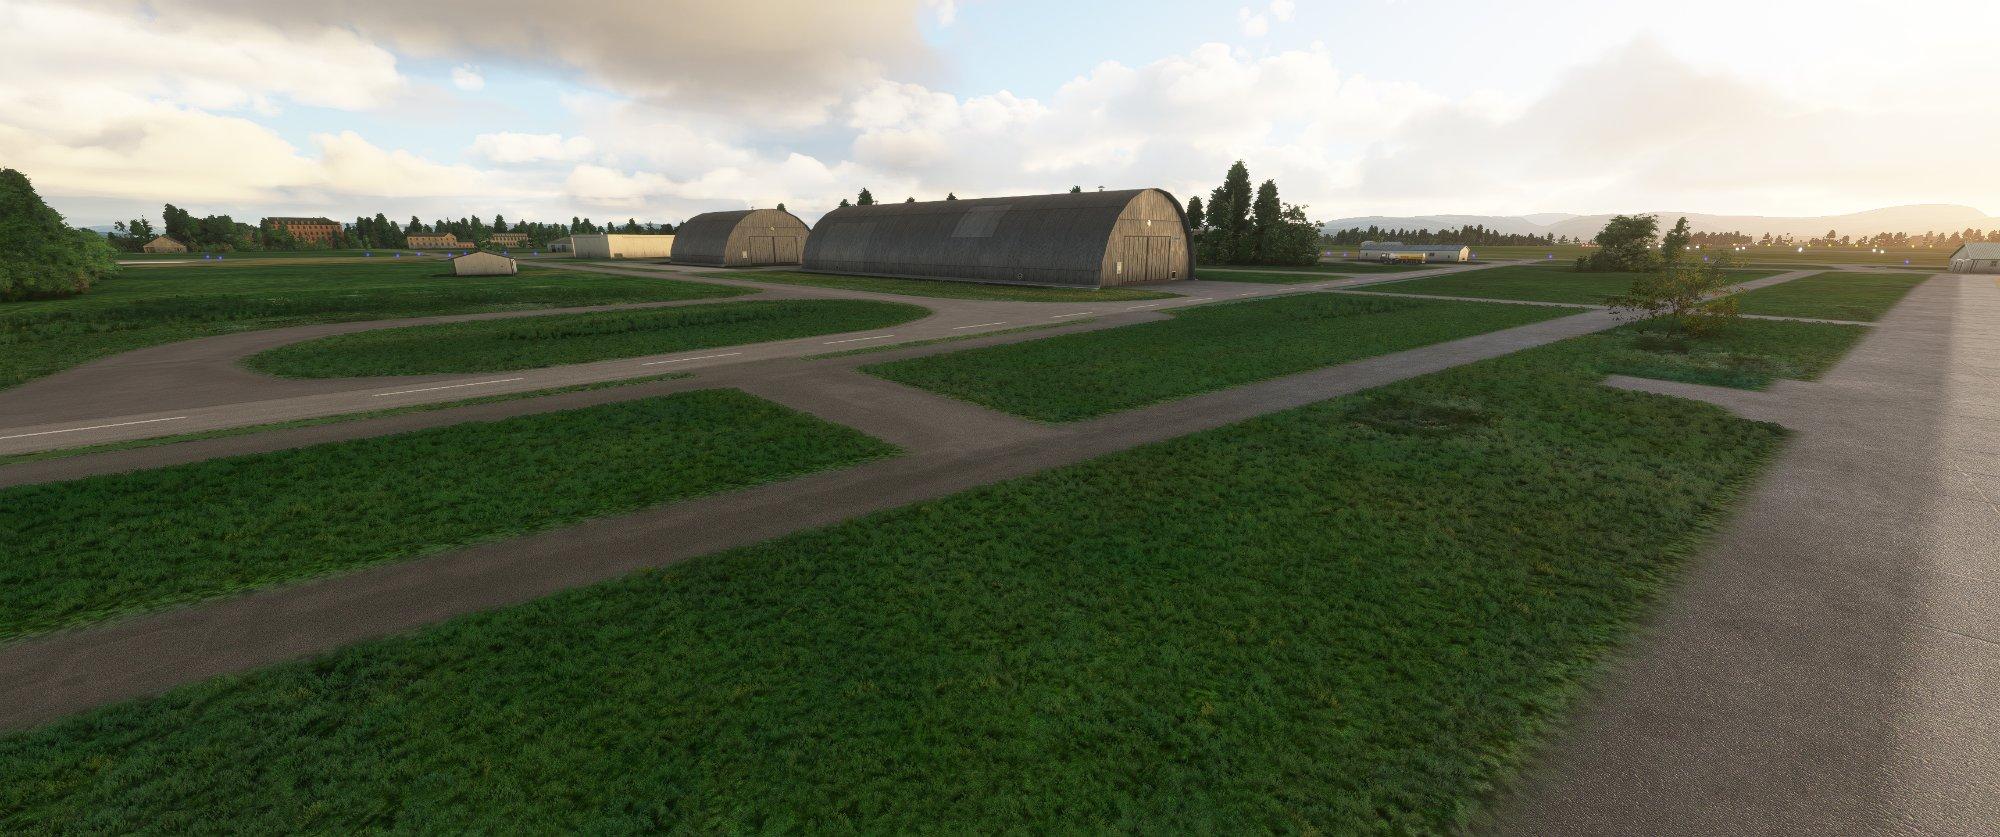 Microsoft Flight Simulator Screenshot 2020.11.09 - 17.42.41.45.jpg